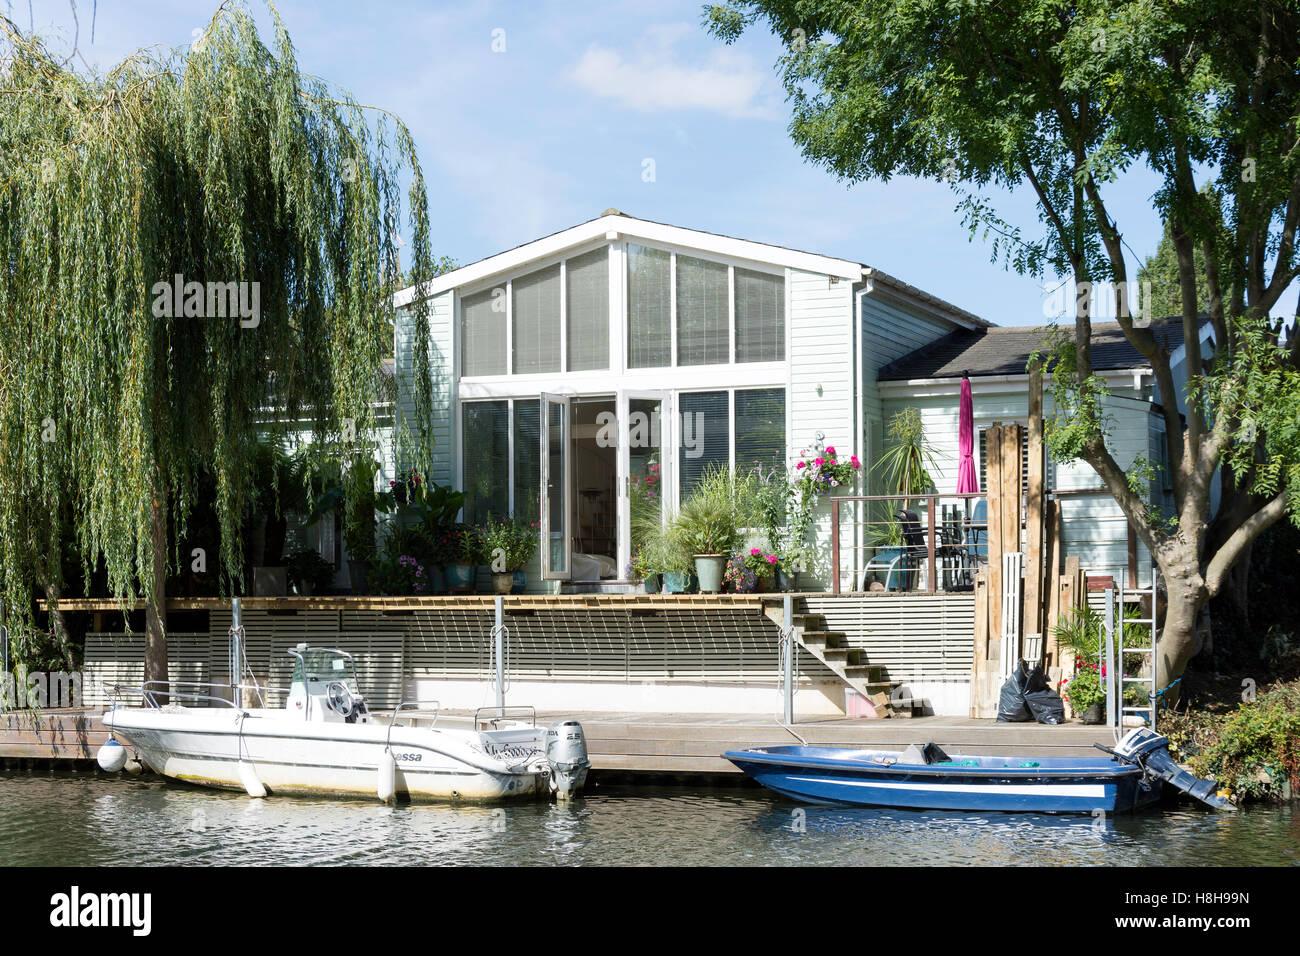 Riverside house on Tagg's Island, River Thames, Hurst Park, West Molesey, Surrey, England, United Kingdom Stock Photo